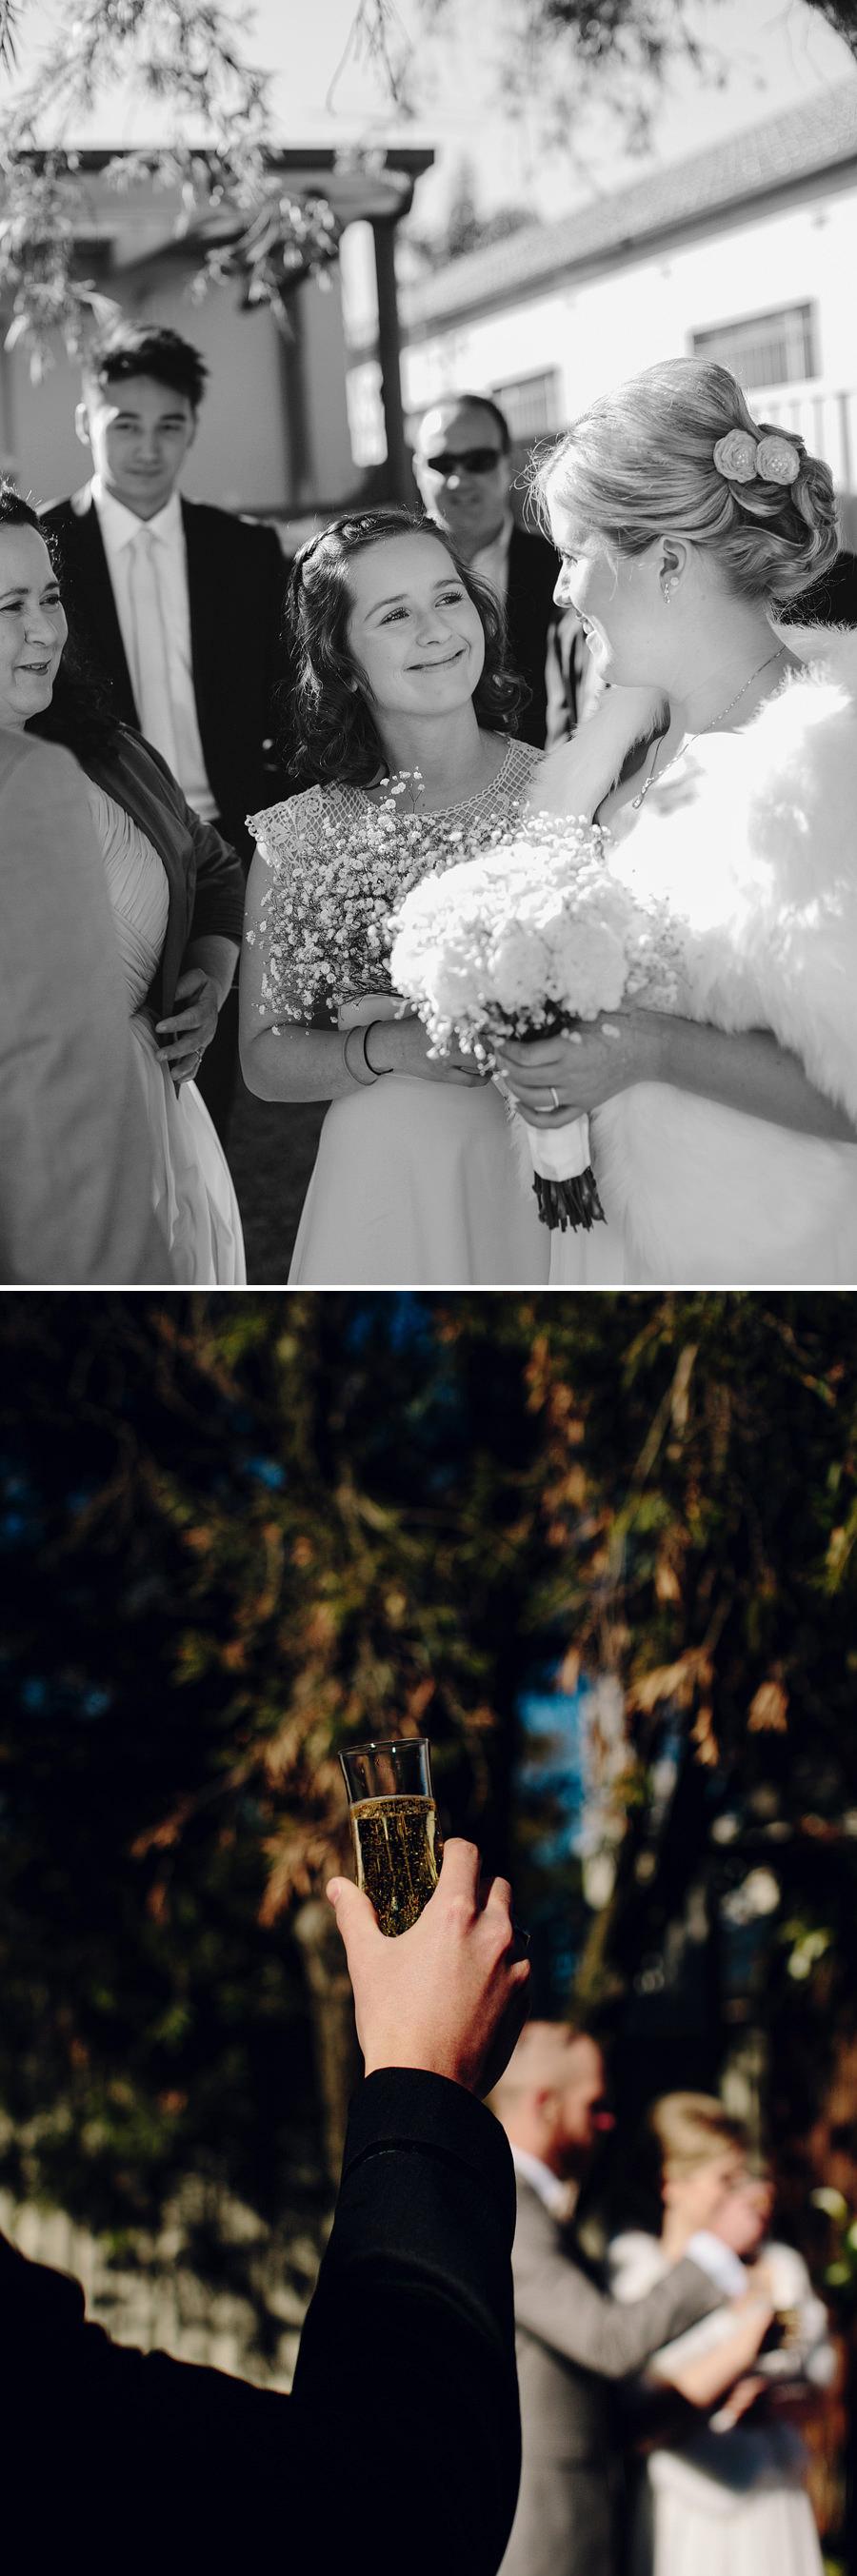 Winter Wedding Photography: Toast